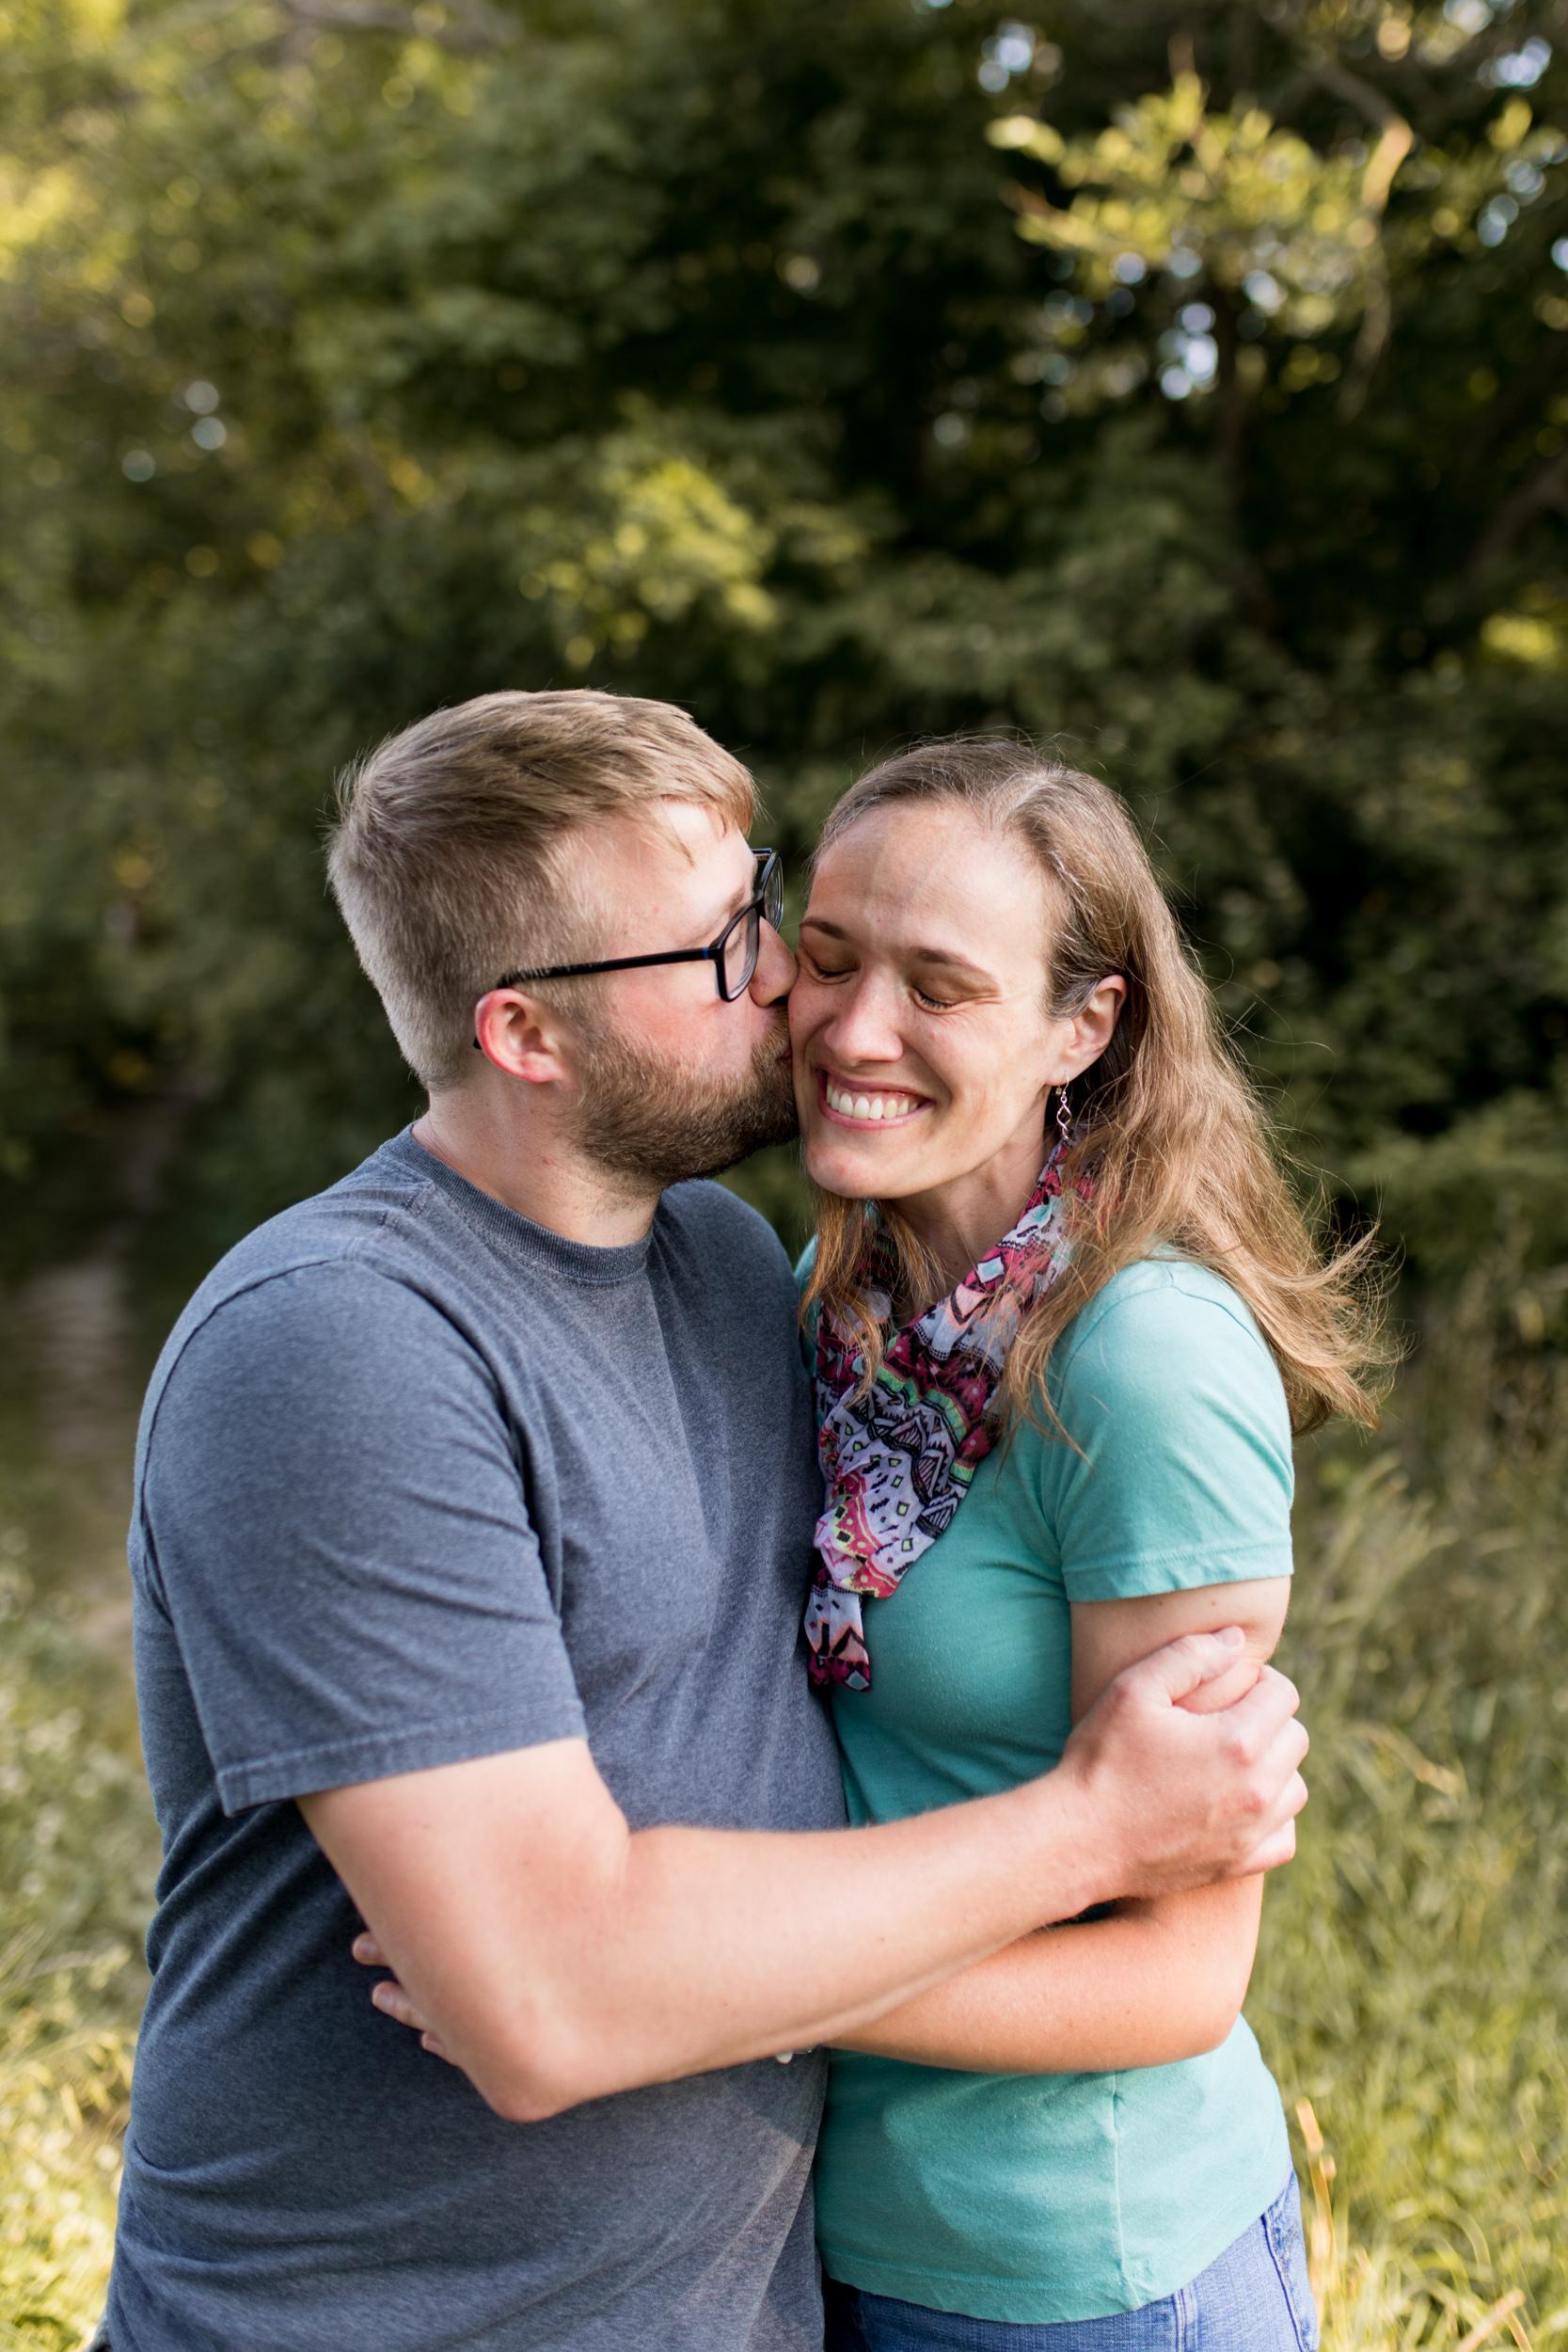 dad kisses mom on cheek during family session at Kokomo Reservoir